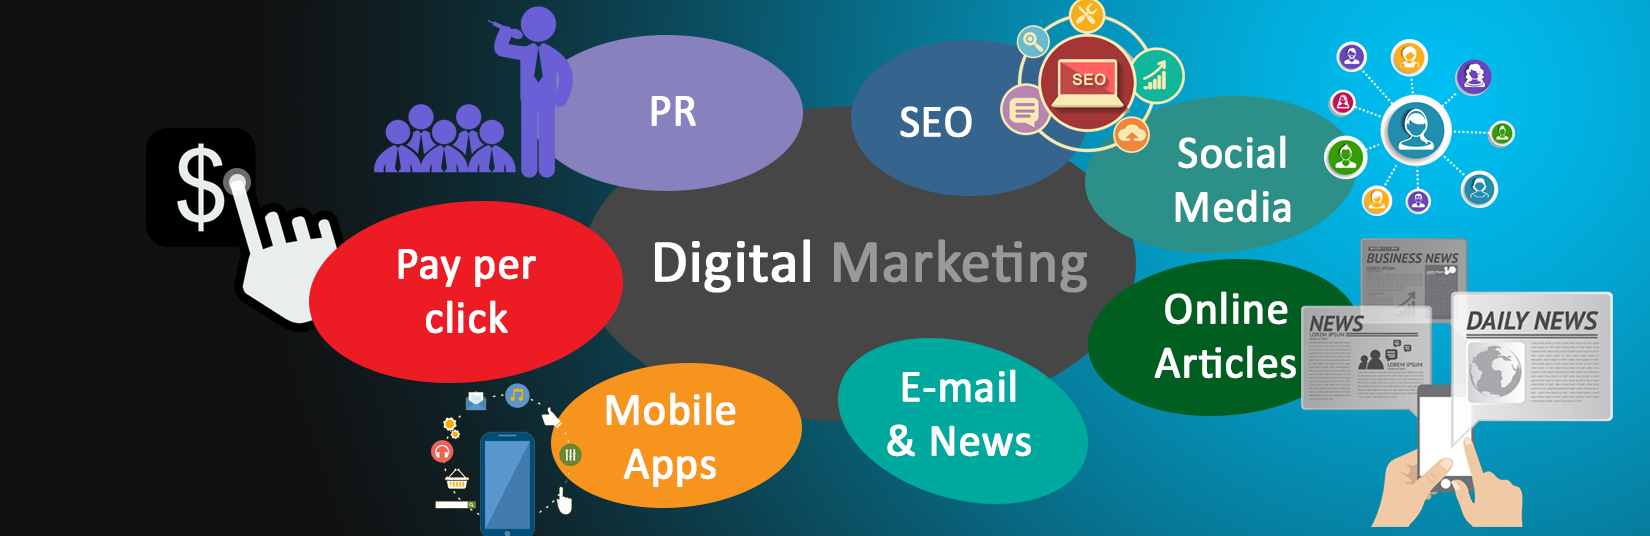 3 Reasons Why You Need Digital Marketing